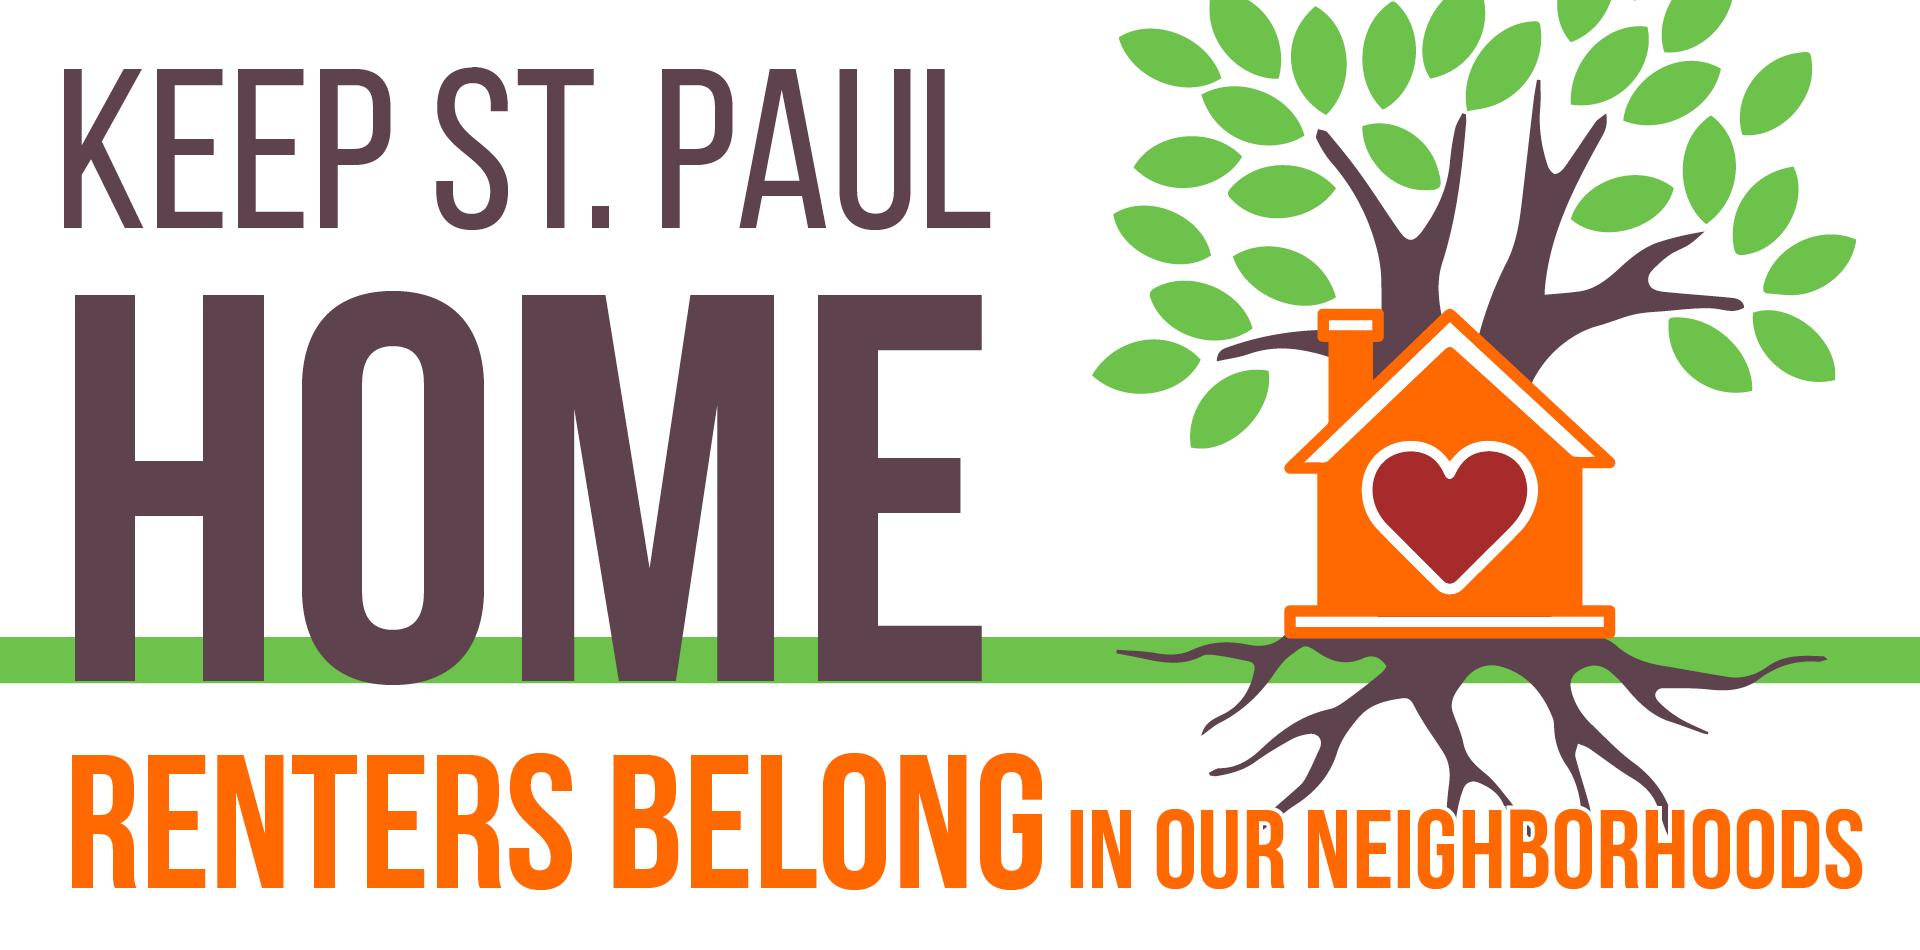 keep st paul home